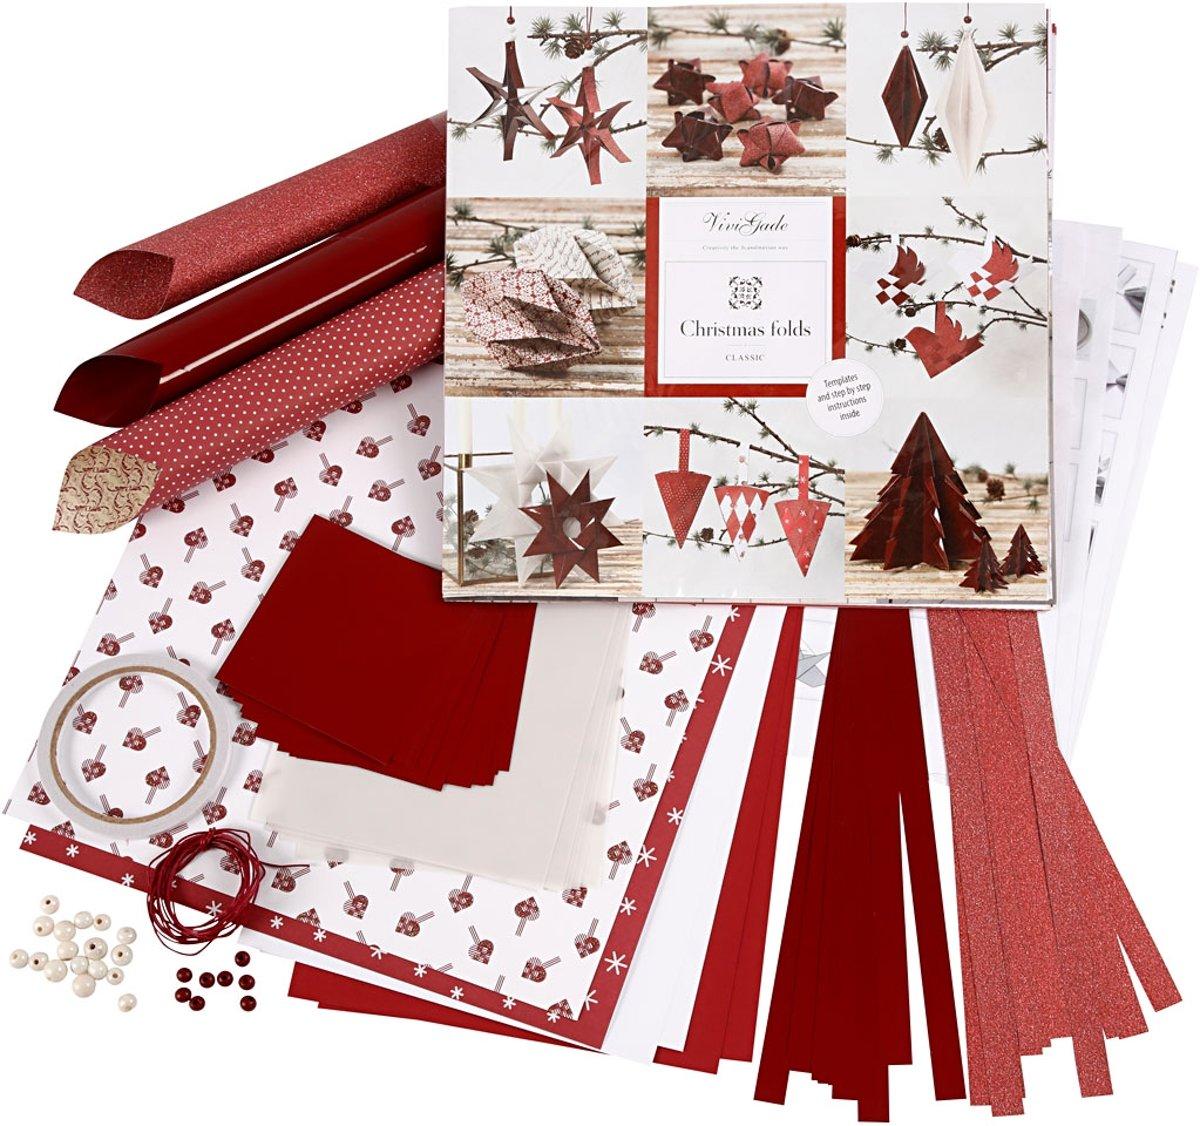 Vlecht en vouw set, wit, rood, 1set [HOB-97777] kopen